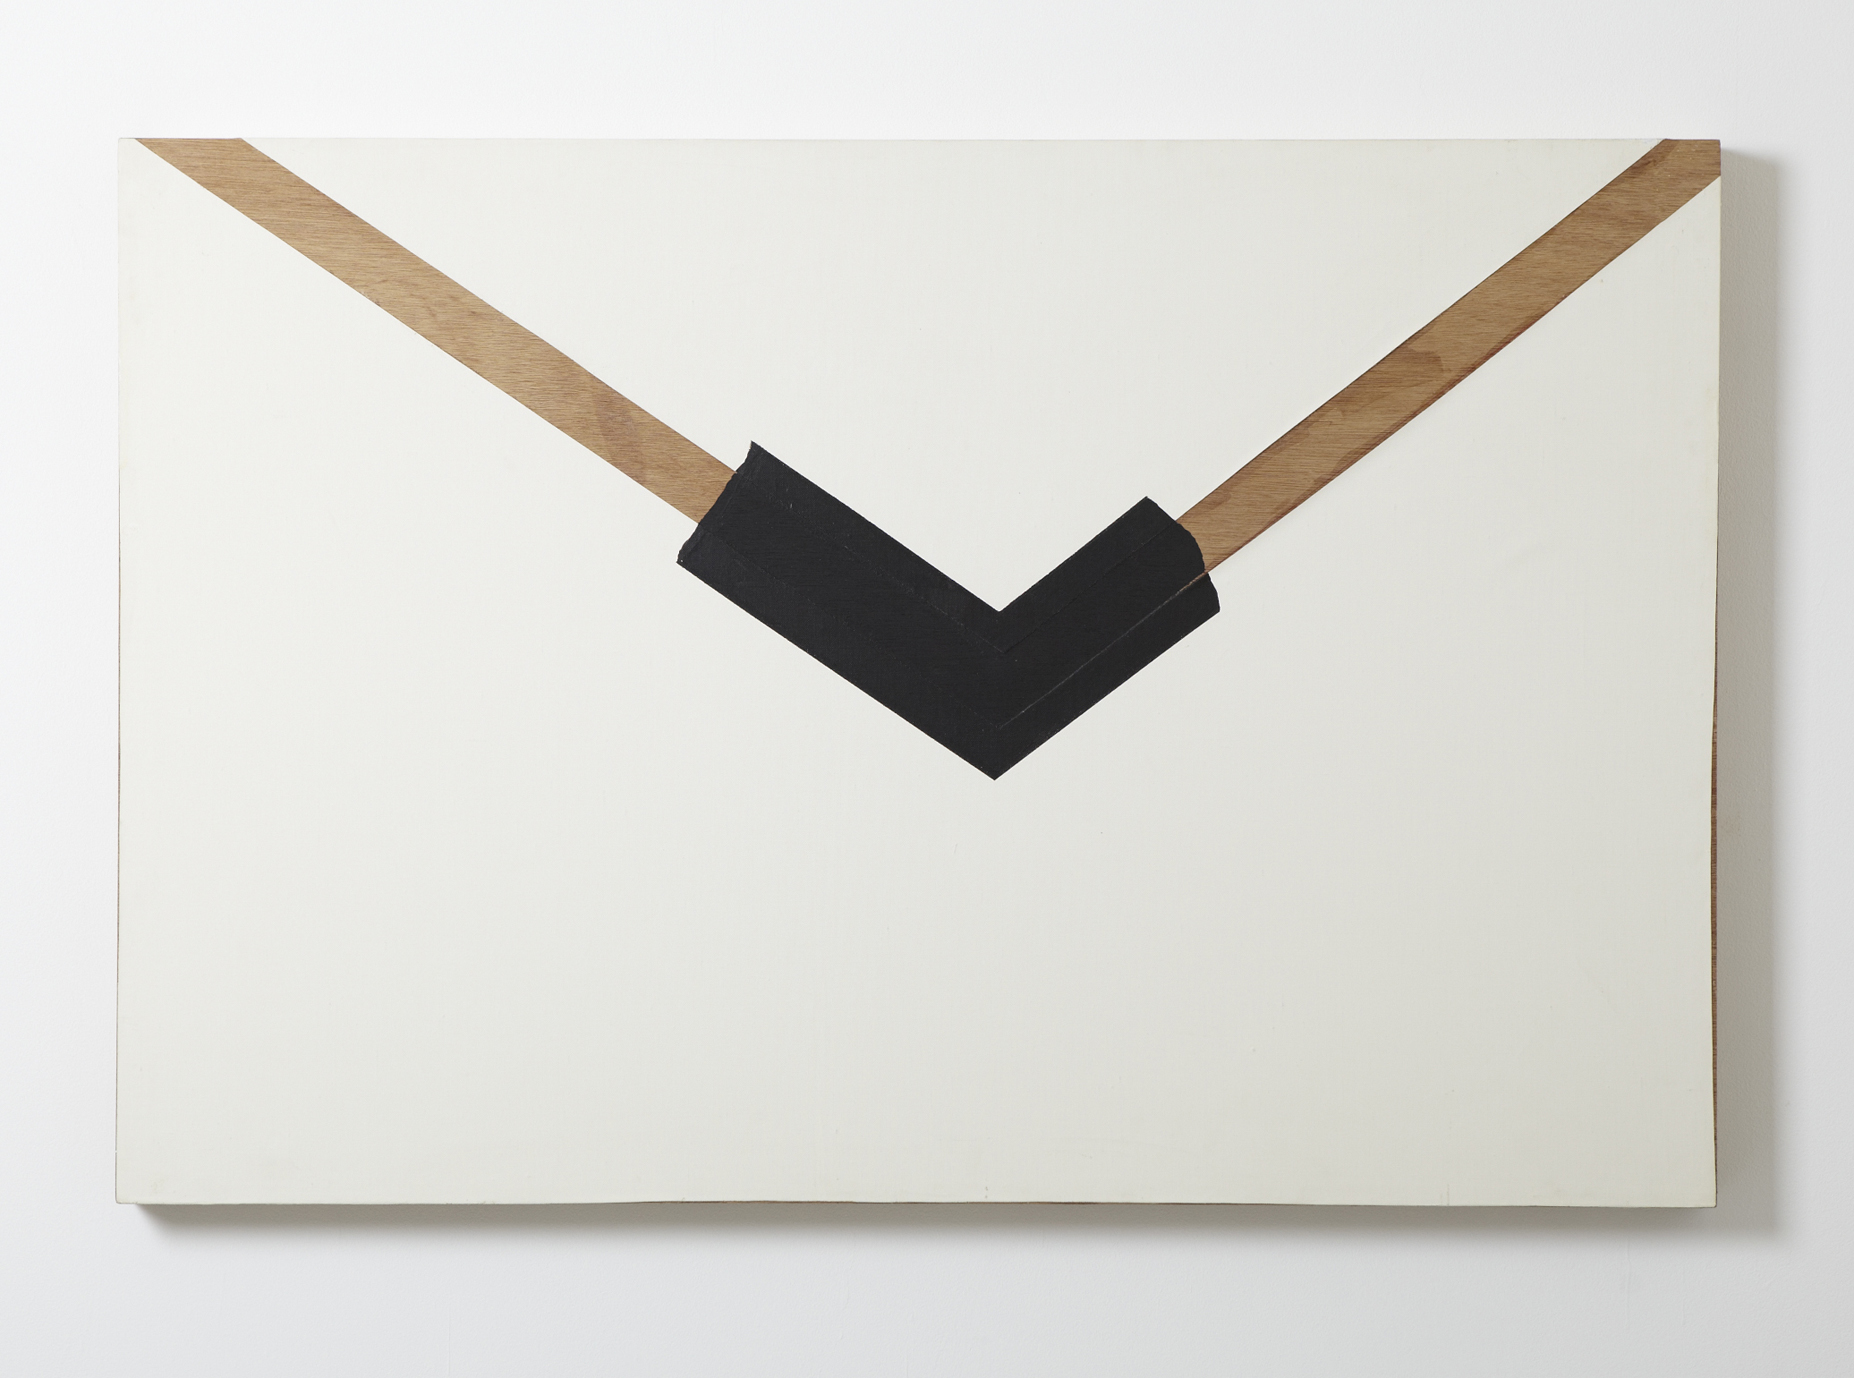 Protrusion.781 , 1981 Wood, acrylic, canvas 35 7/8 x 53 1/2 x 2 1/2 inches 91 x 136 x 6.5 cm